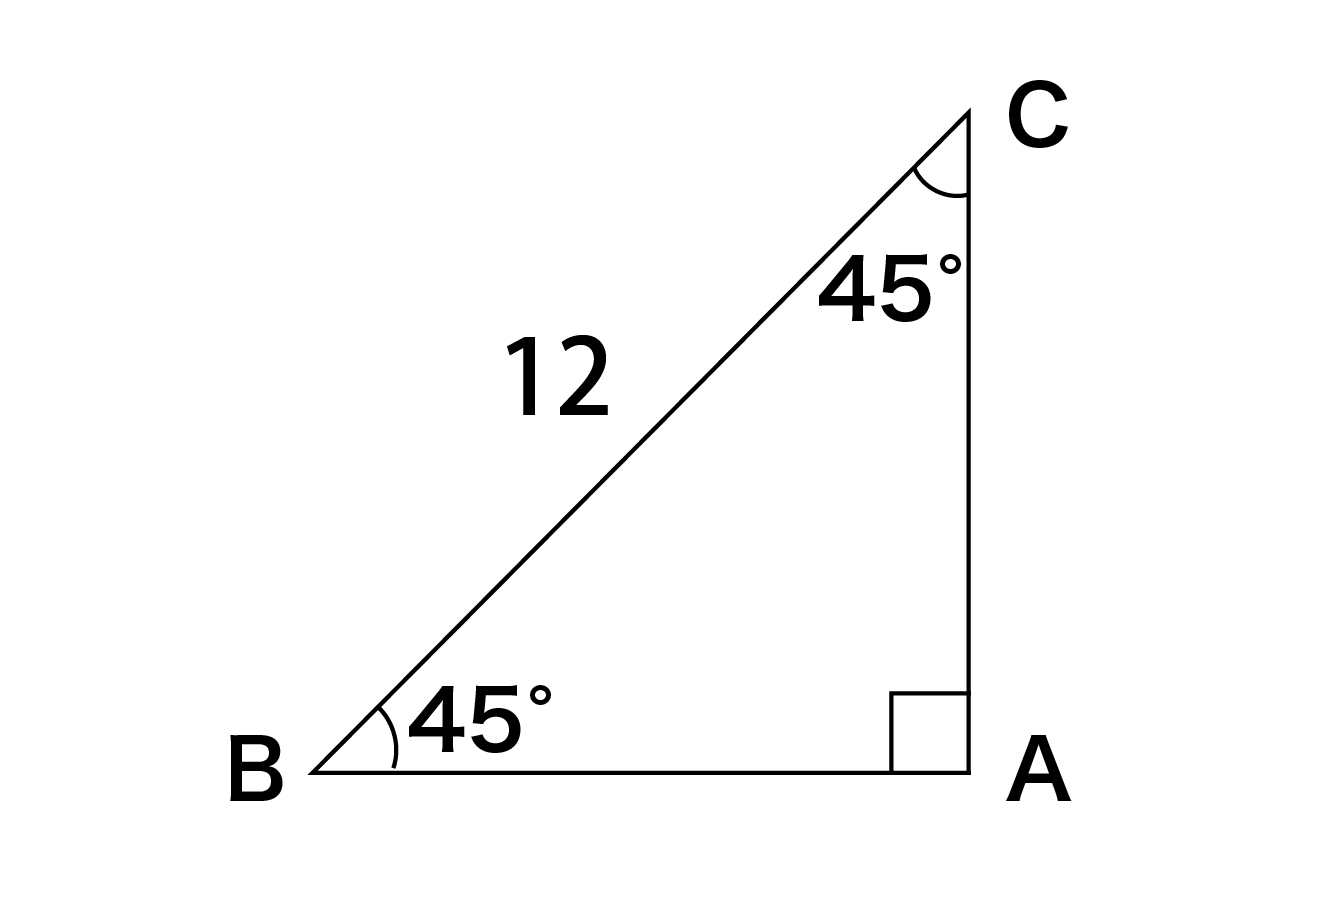 BC=12の直角二等辺三角形